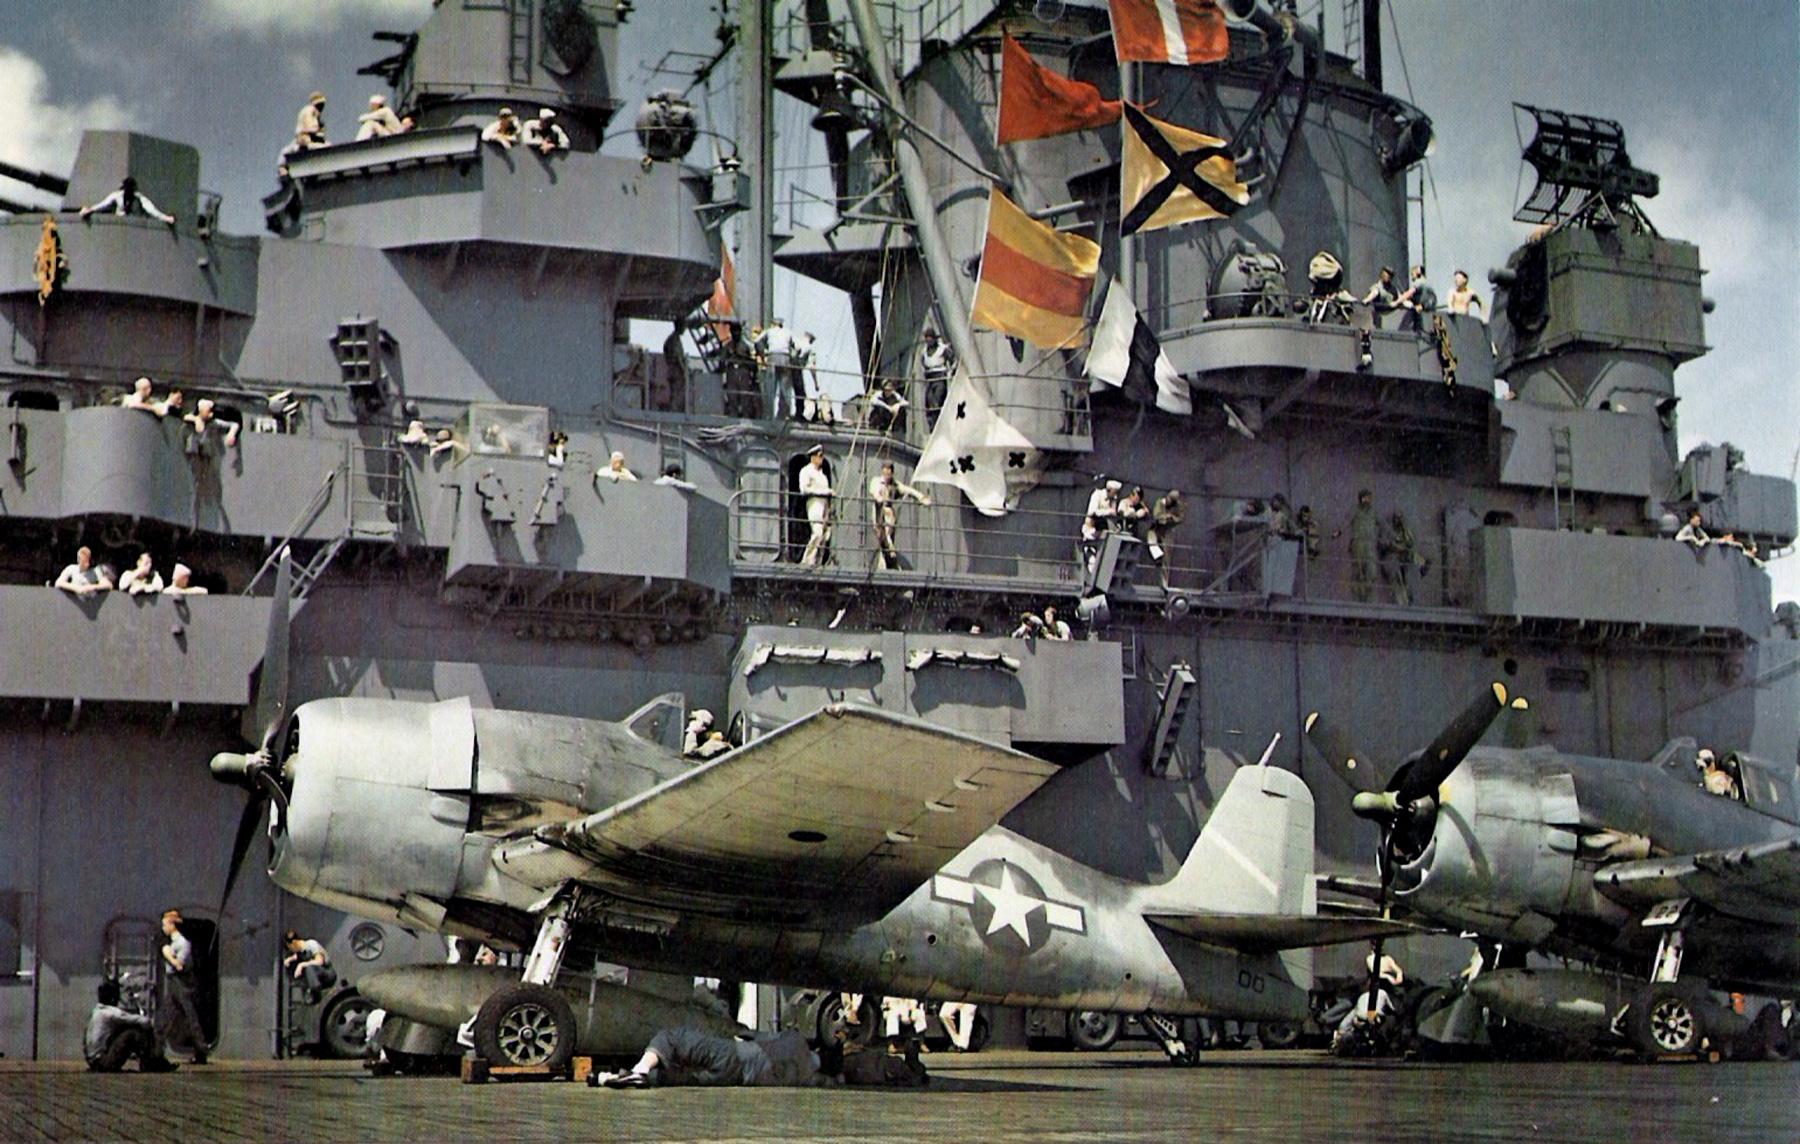 Grumman F6F 3 Hellcat VF 5 White 00 Marcus Island raid CV 10 USS Yorktown 1943 01